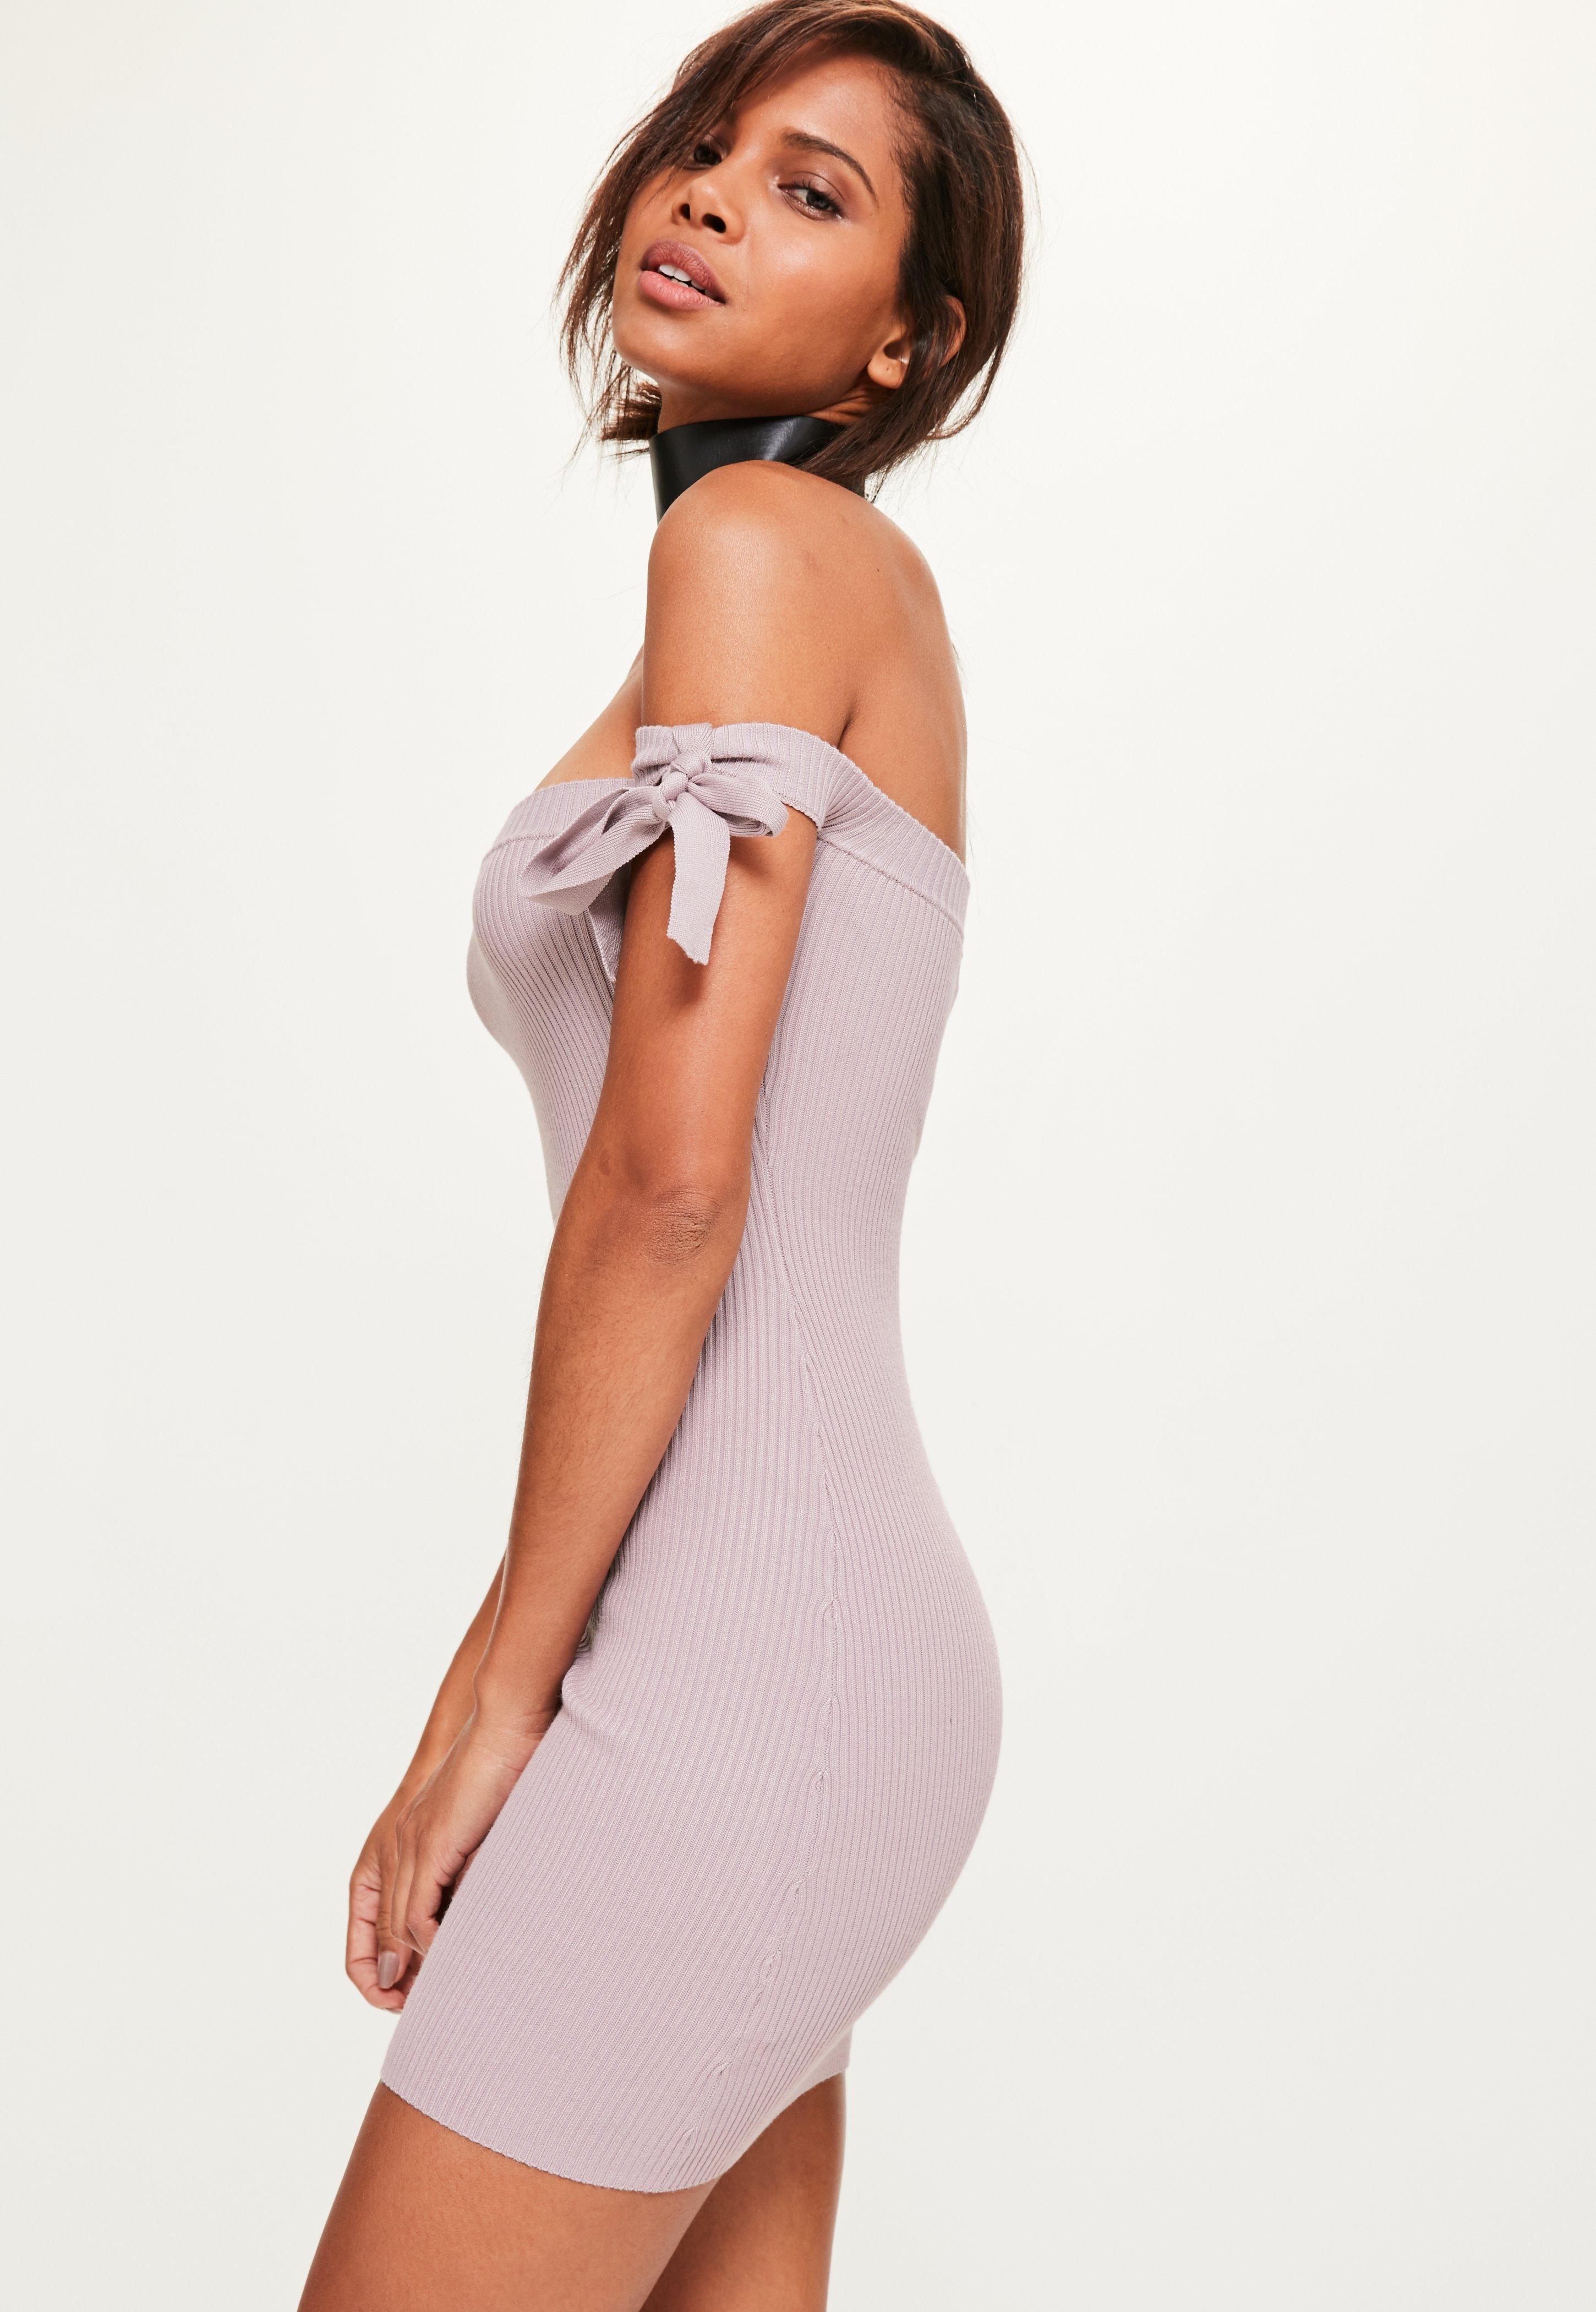 a720187509 Lyst - Missguided Purple Tie Bardot Ribbed Knitted Mini Dress in Purple